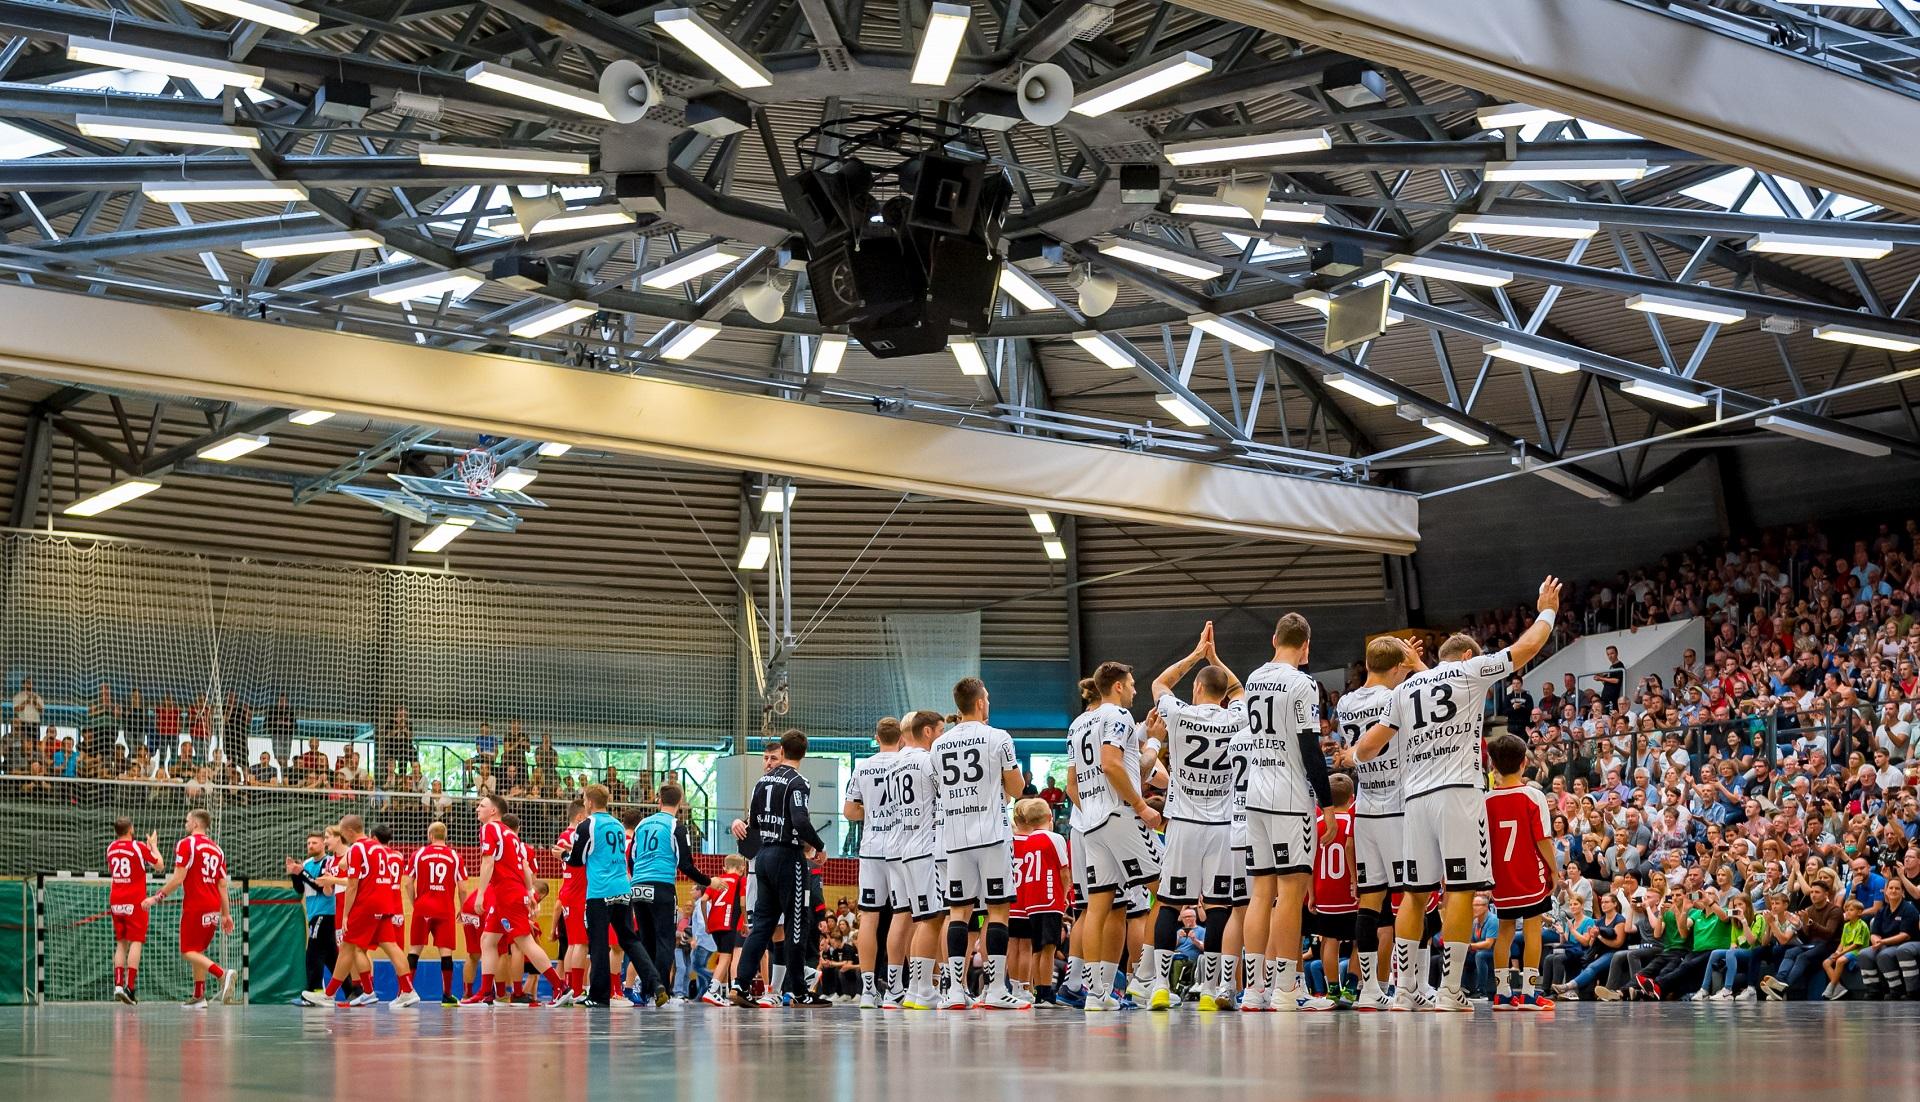 HANDBALL 2019/20: THW Kiel - GSV Eintracht Baunatal